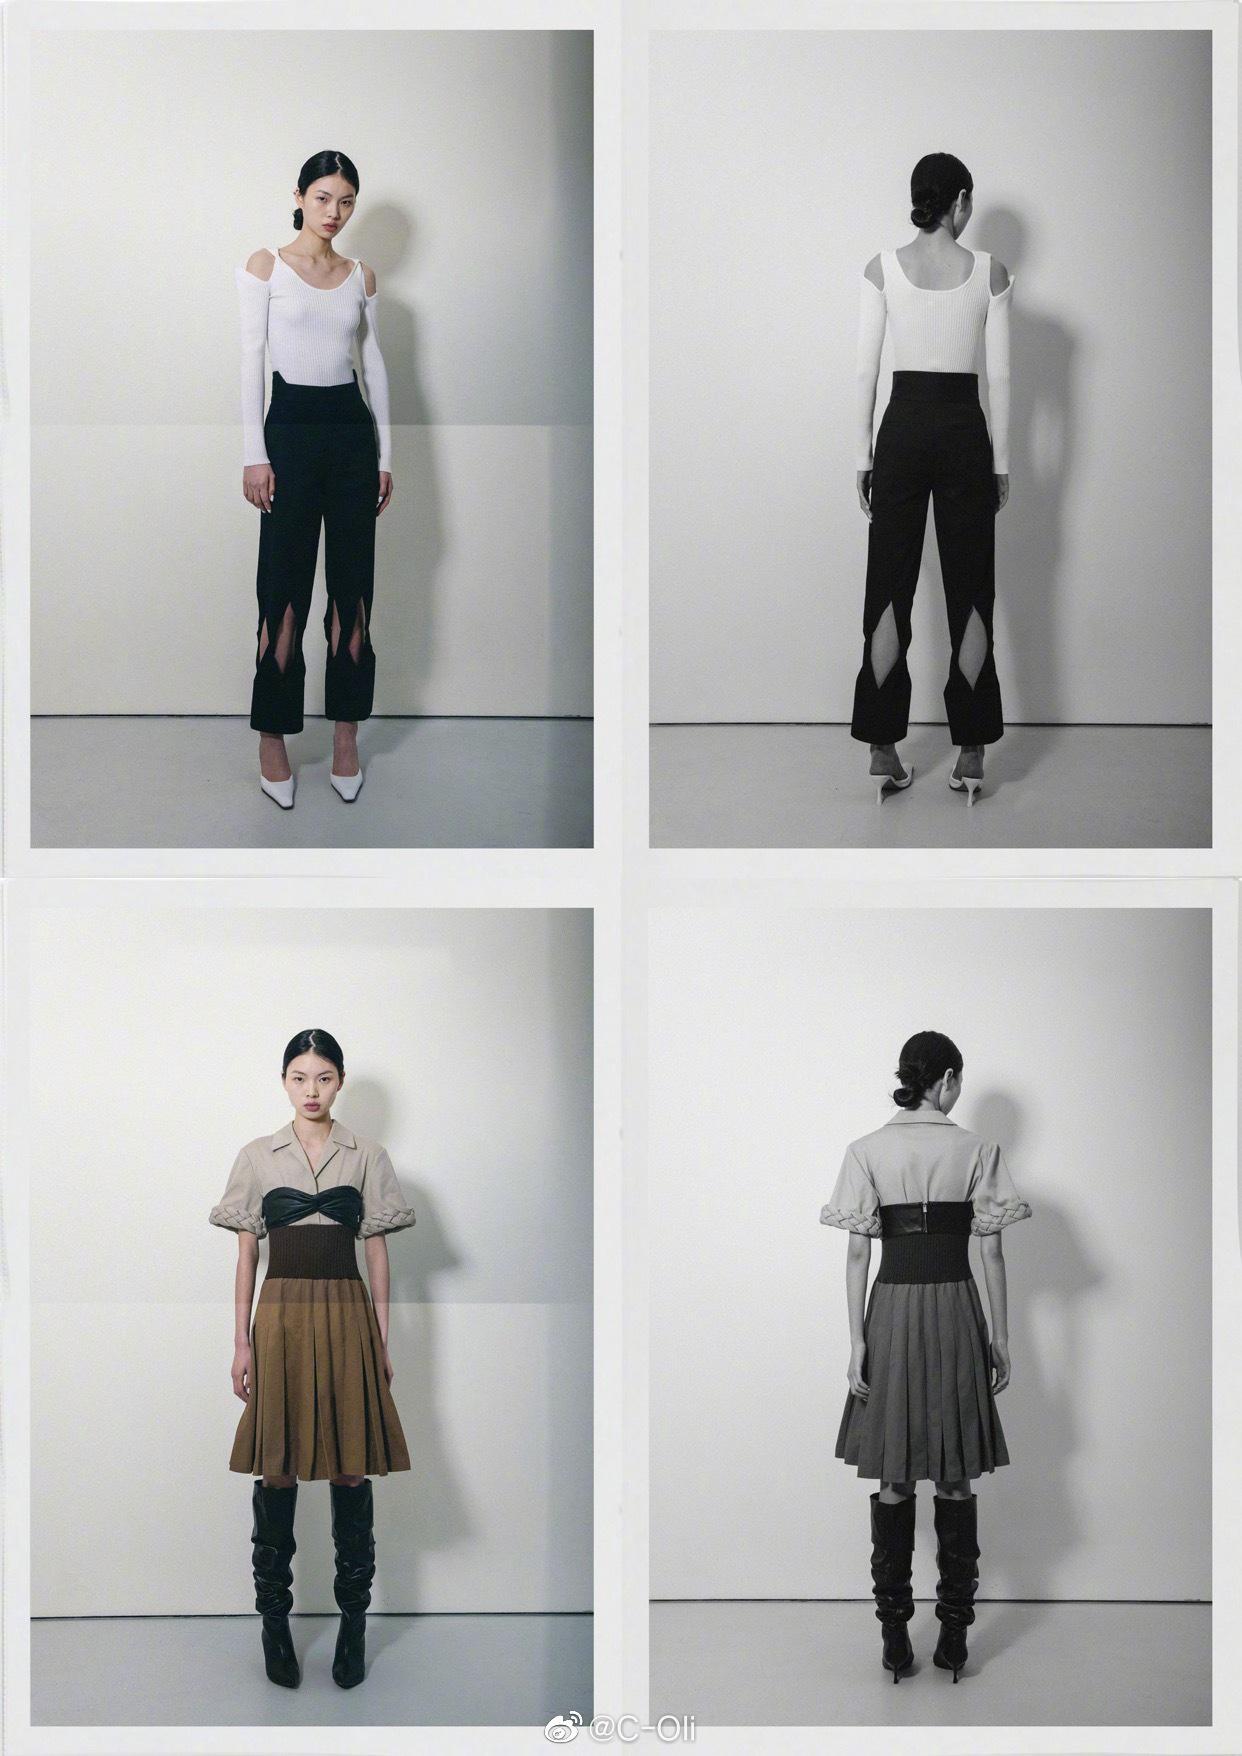 CALVIN LUO F/W 2020  ||  CALVIN LUO发布了品牌2020秋冬女装系列